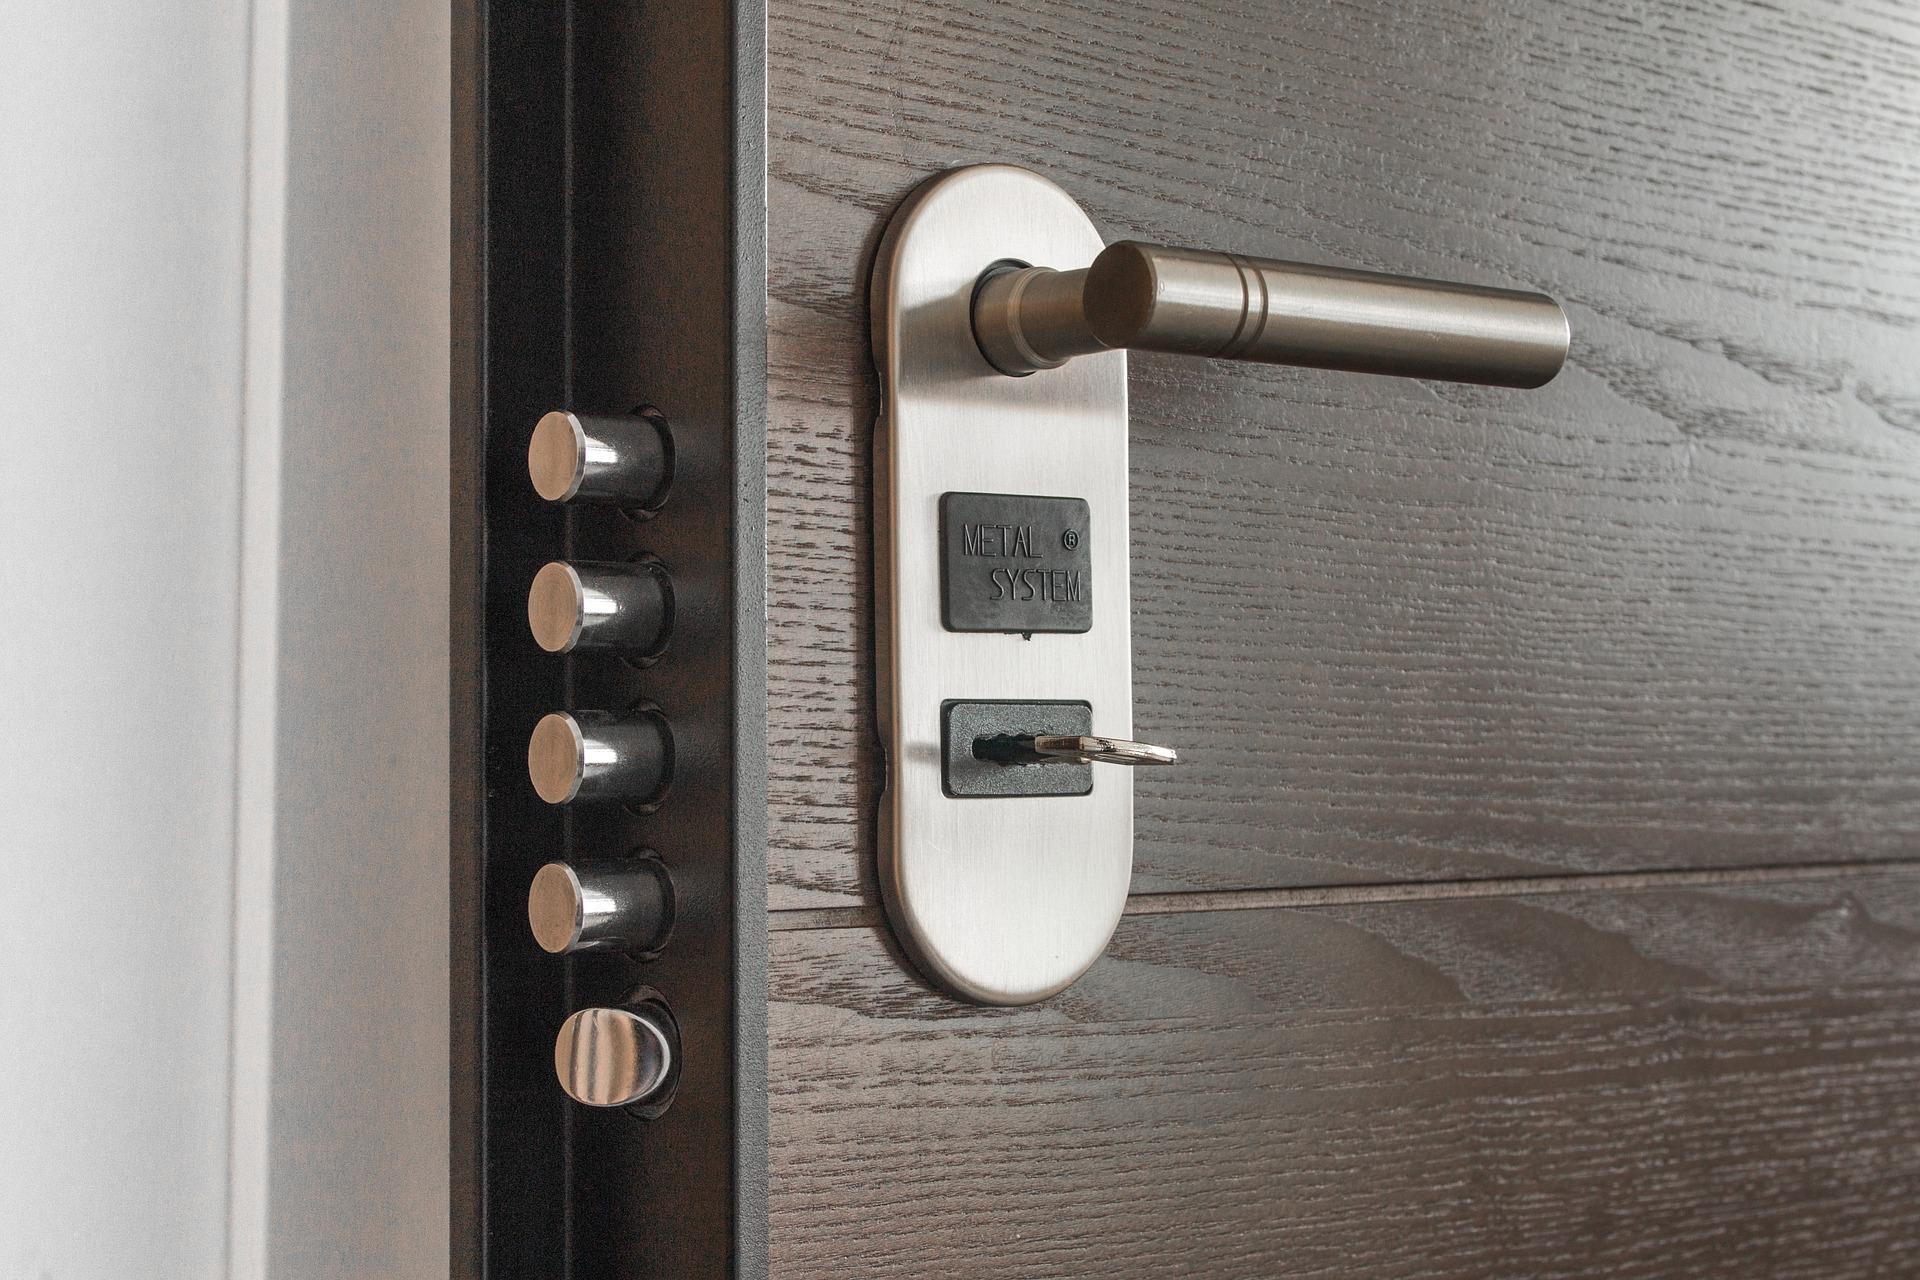 Kako izbrati najboljšo ključavnico za vaša vrata?